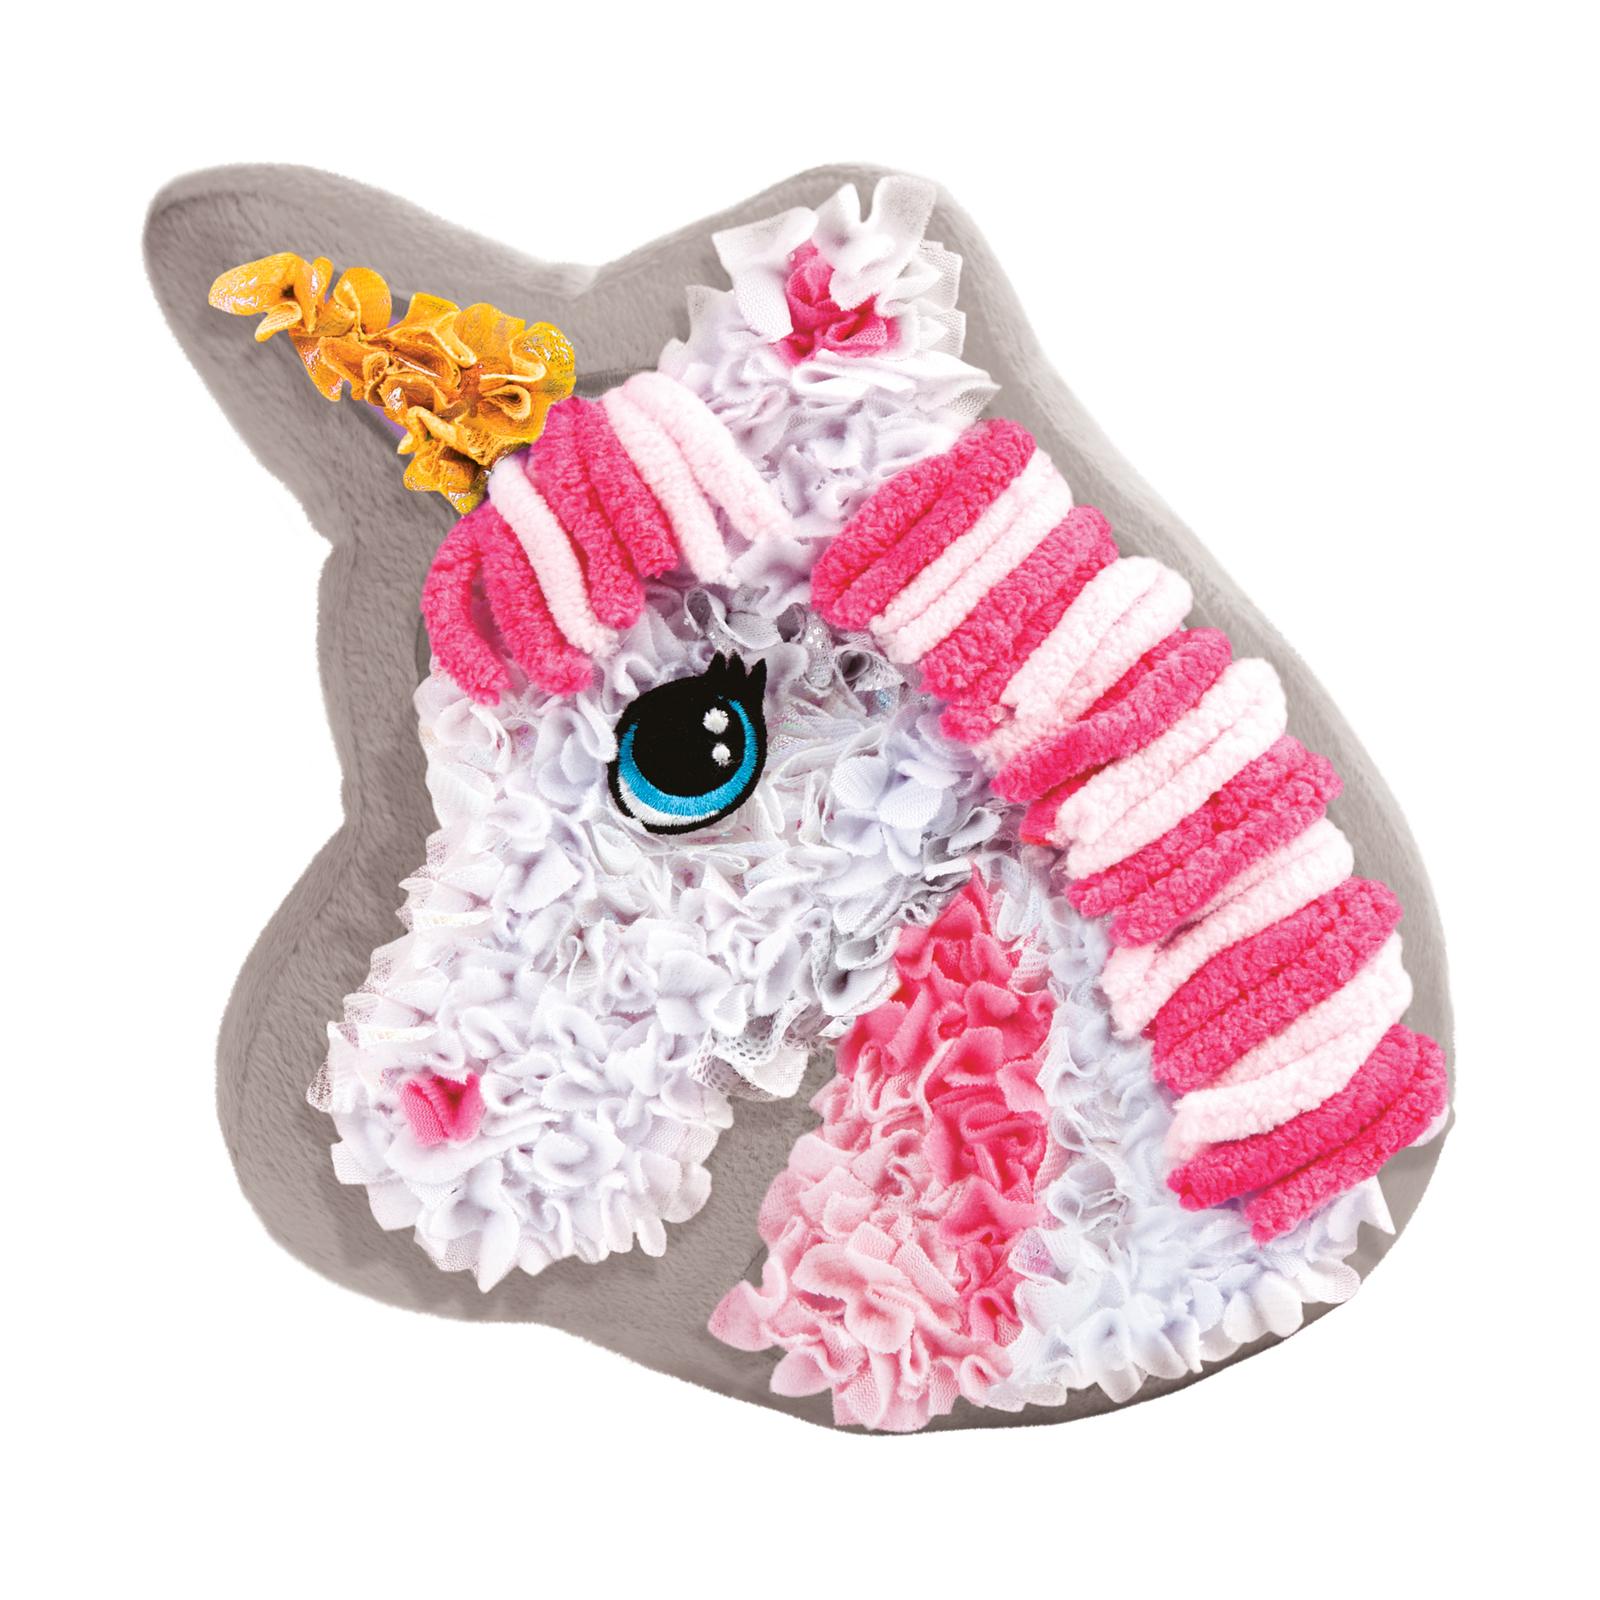 My Design Unicorn Pillow Plushcraft Kit Toy